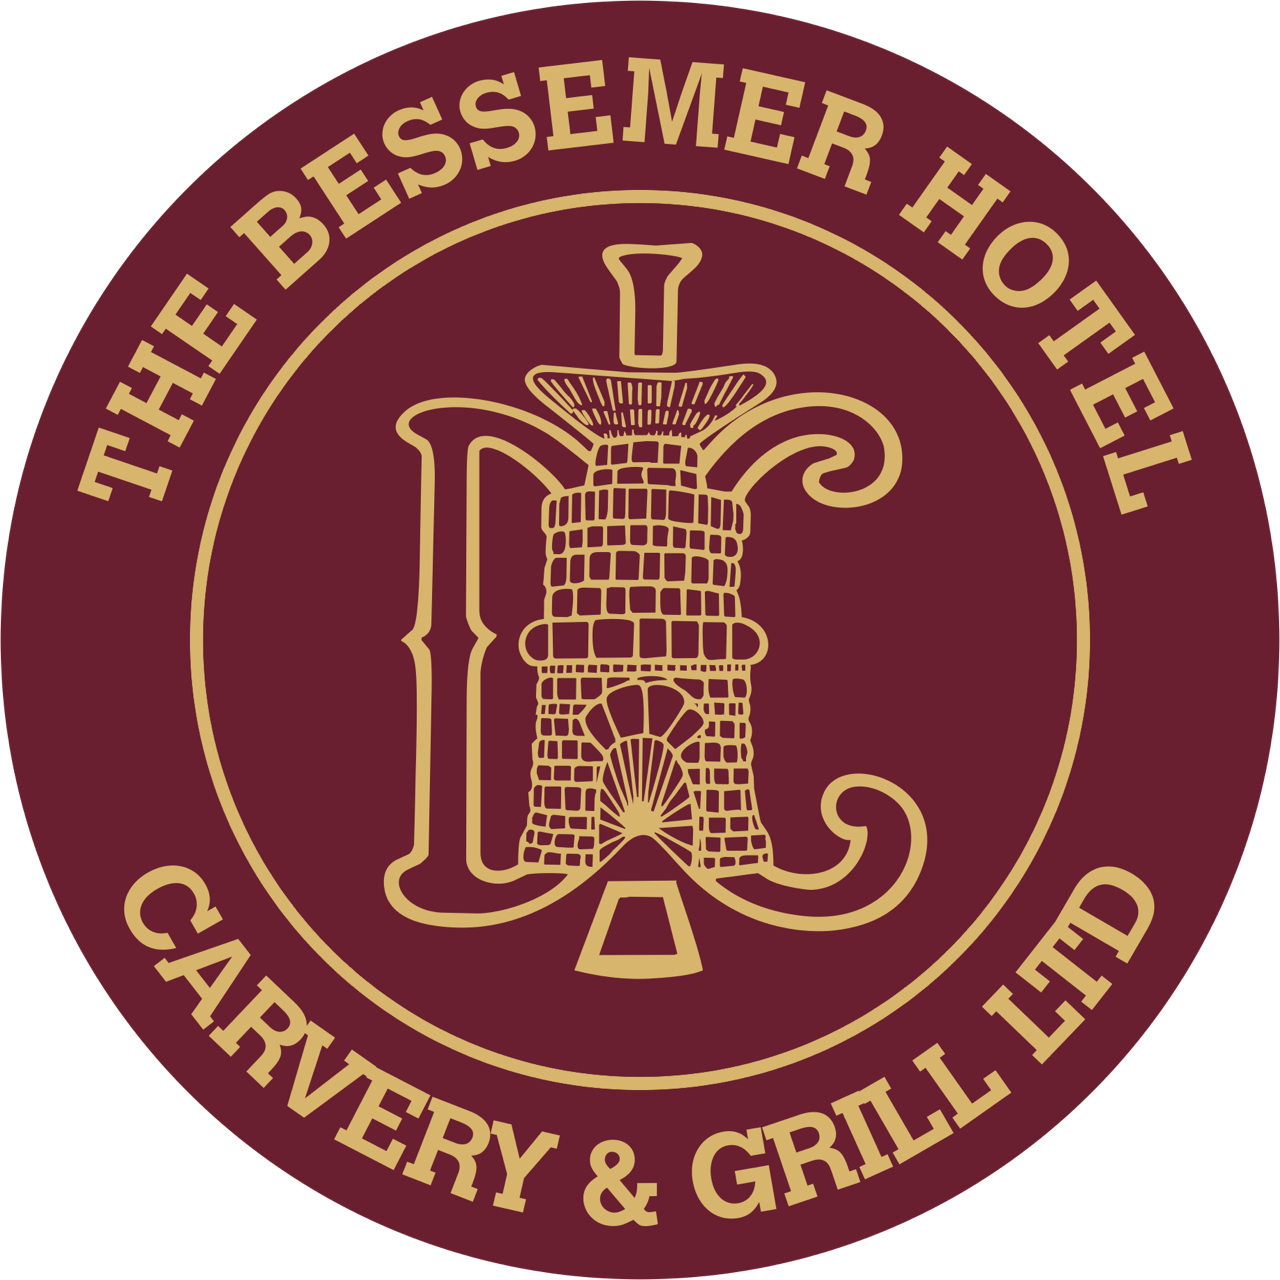 Logo of The Bessemer Hotel